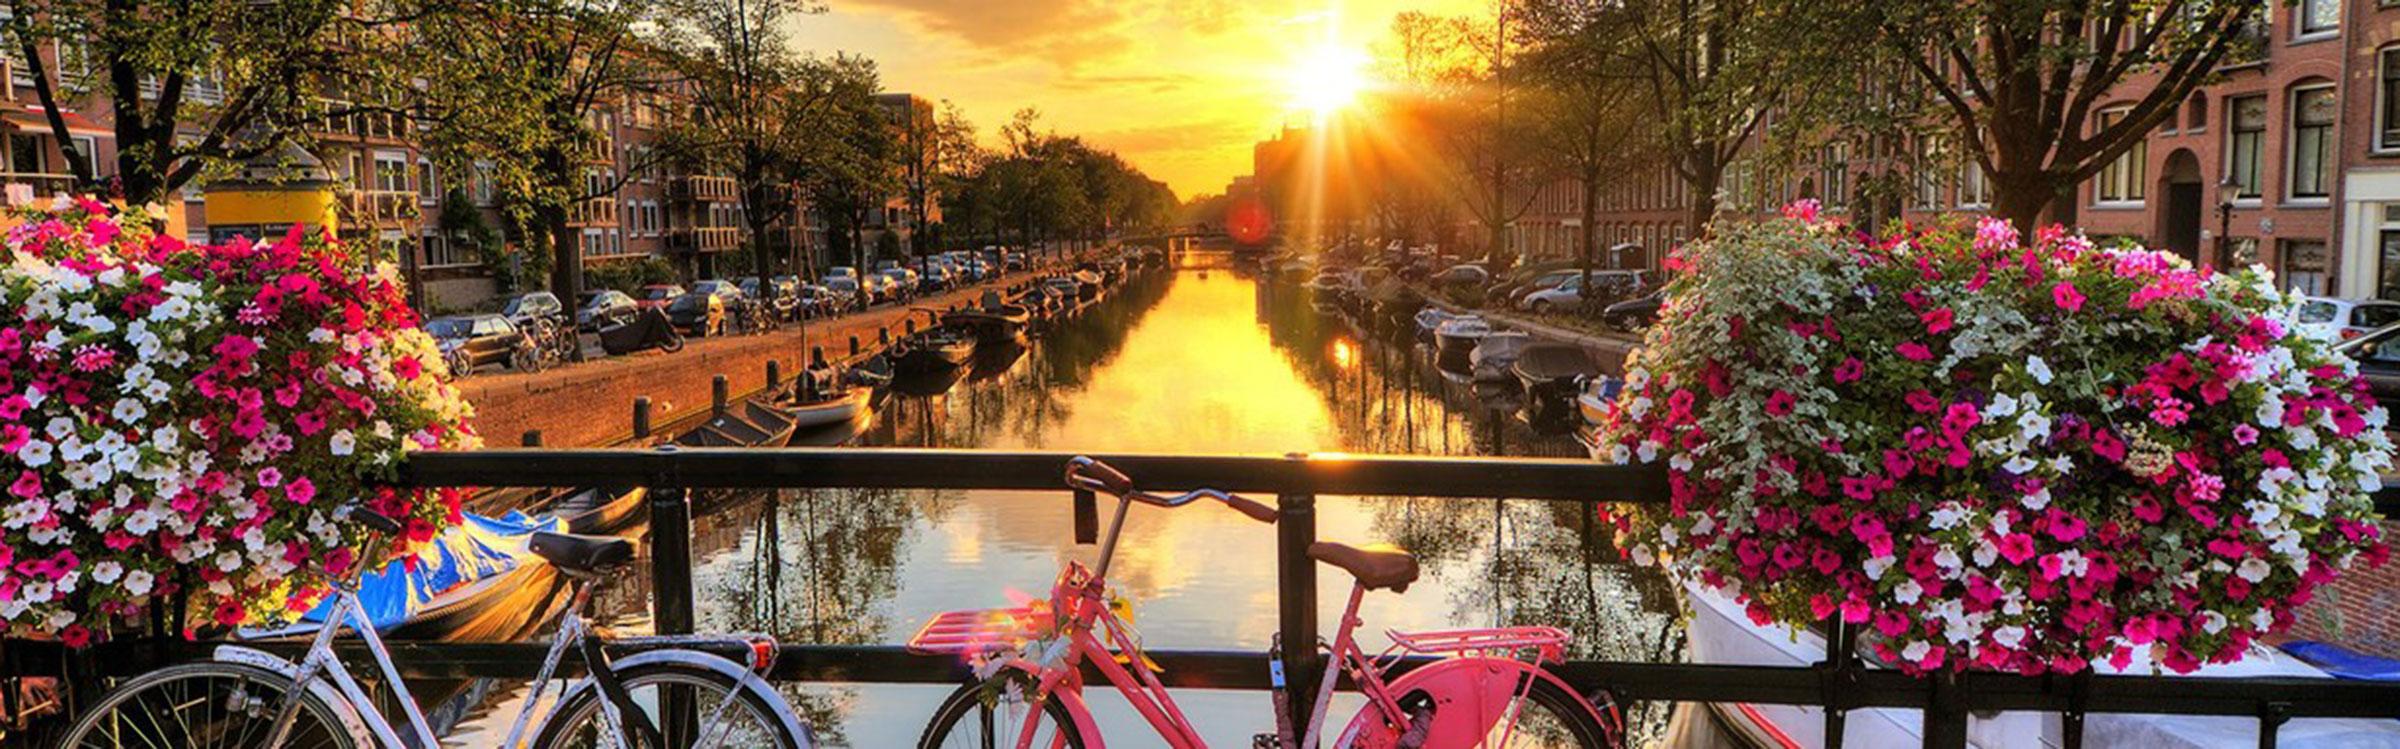 Nederland algemeen